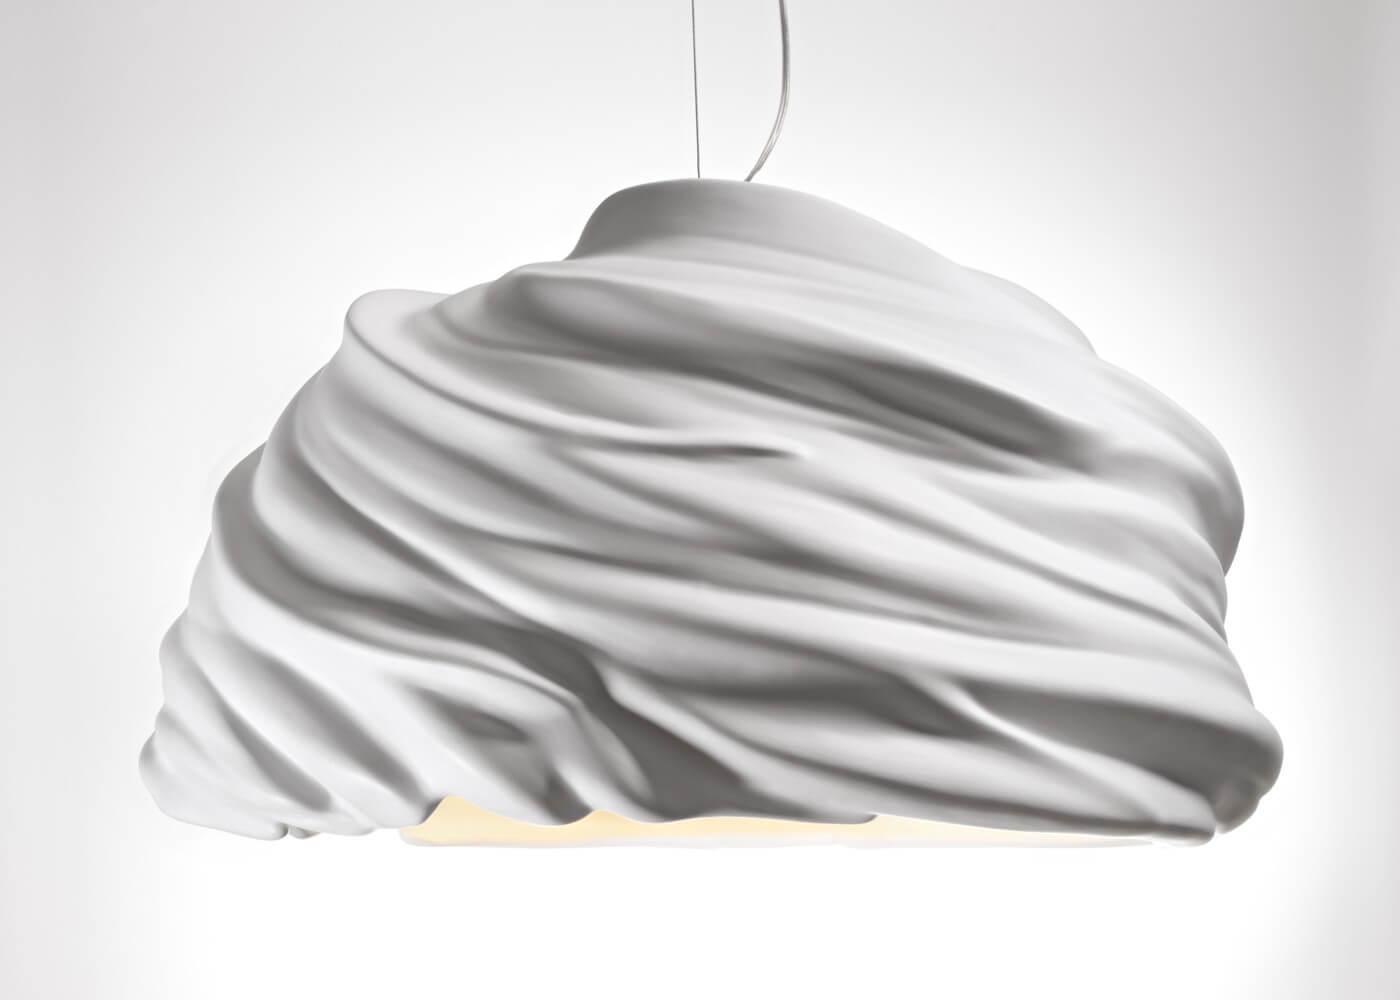 Piękna popularna lampa włoska Cyclone od Fabbian